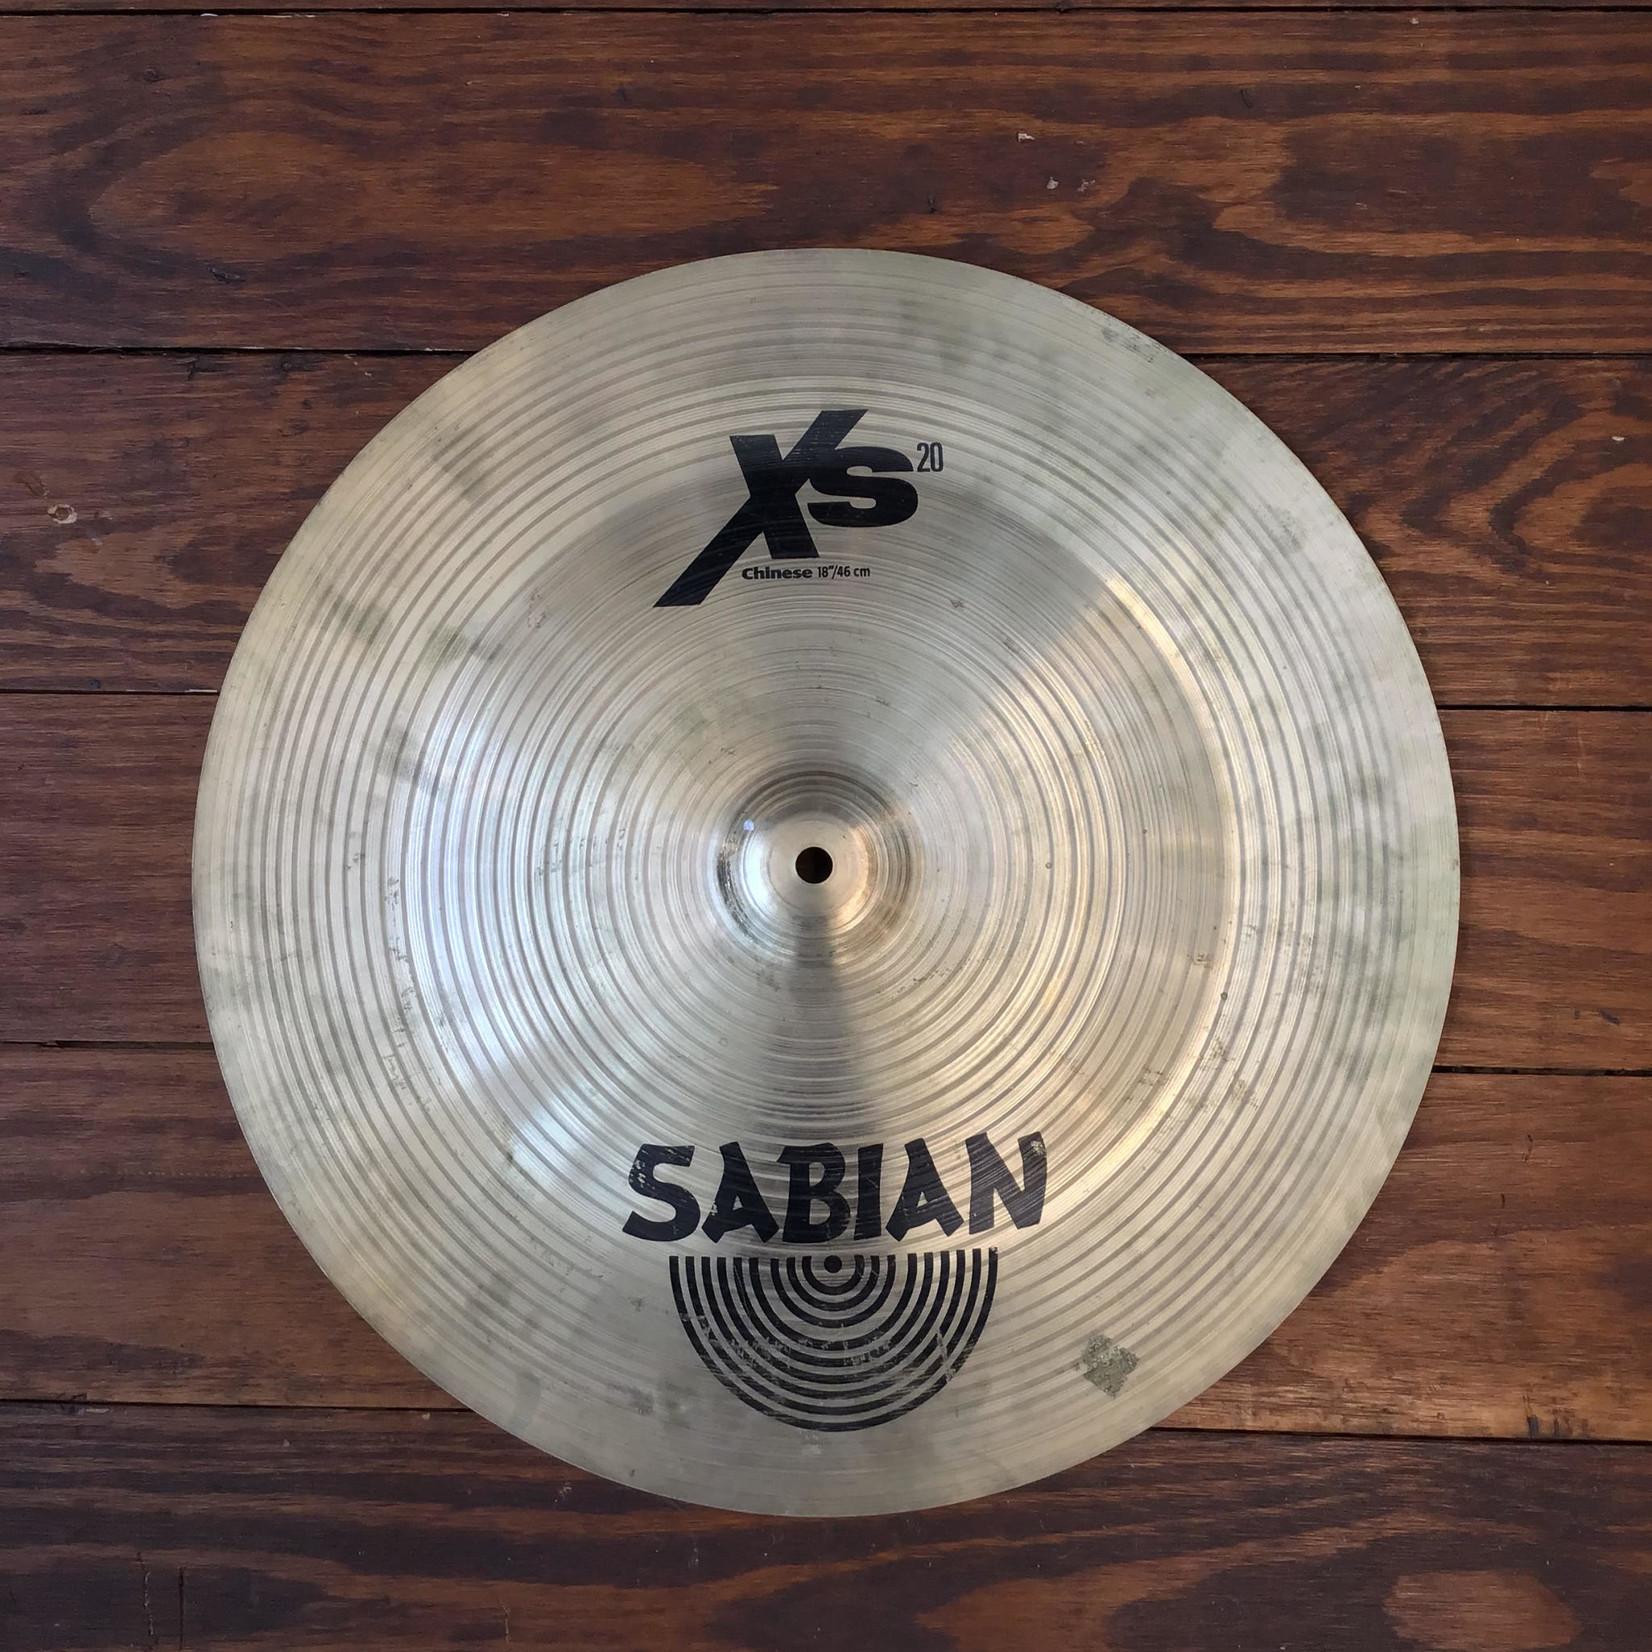 "Sabian USED Sabian XS20 18"" Chinese Cymbal"